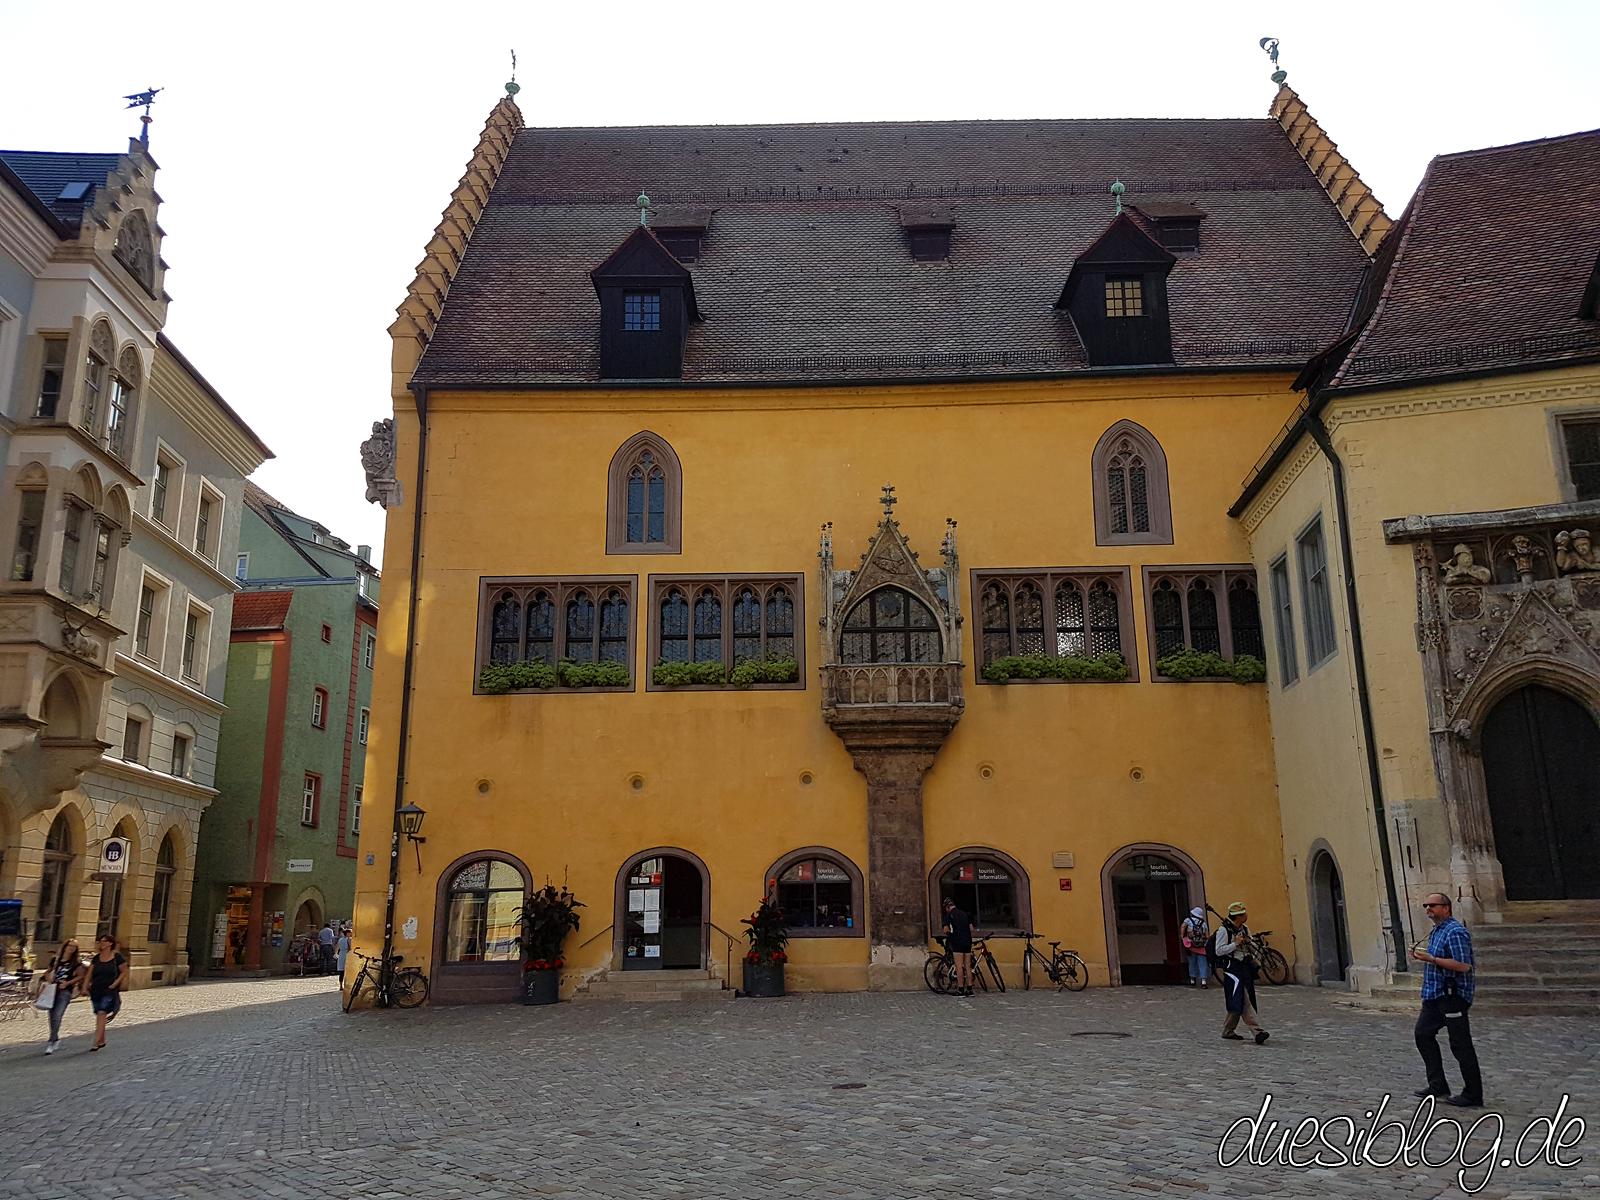 Regensburg Altes Rathaus Travelblog duesiblog 02